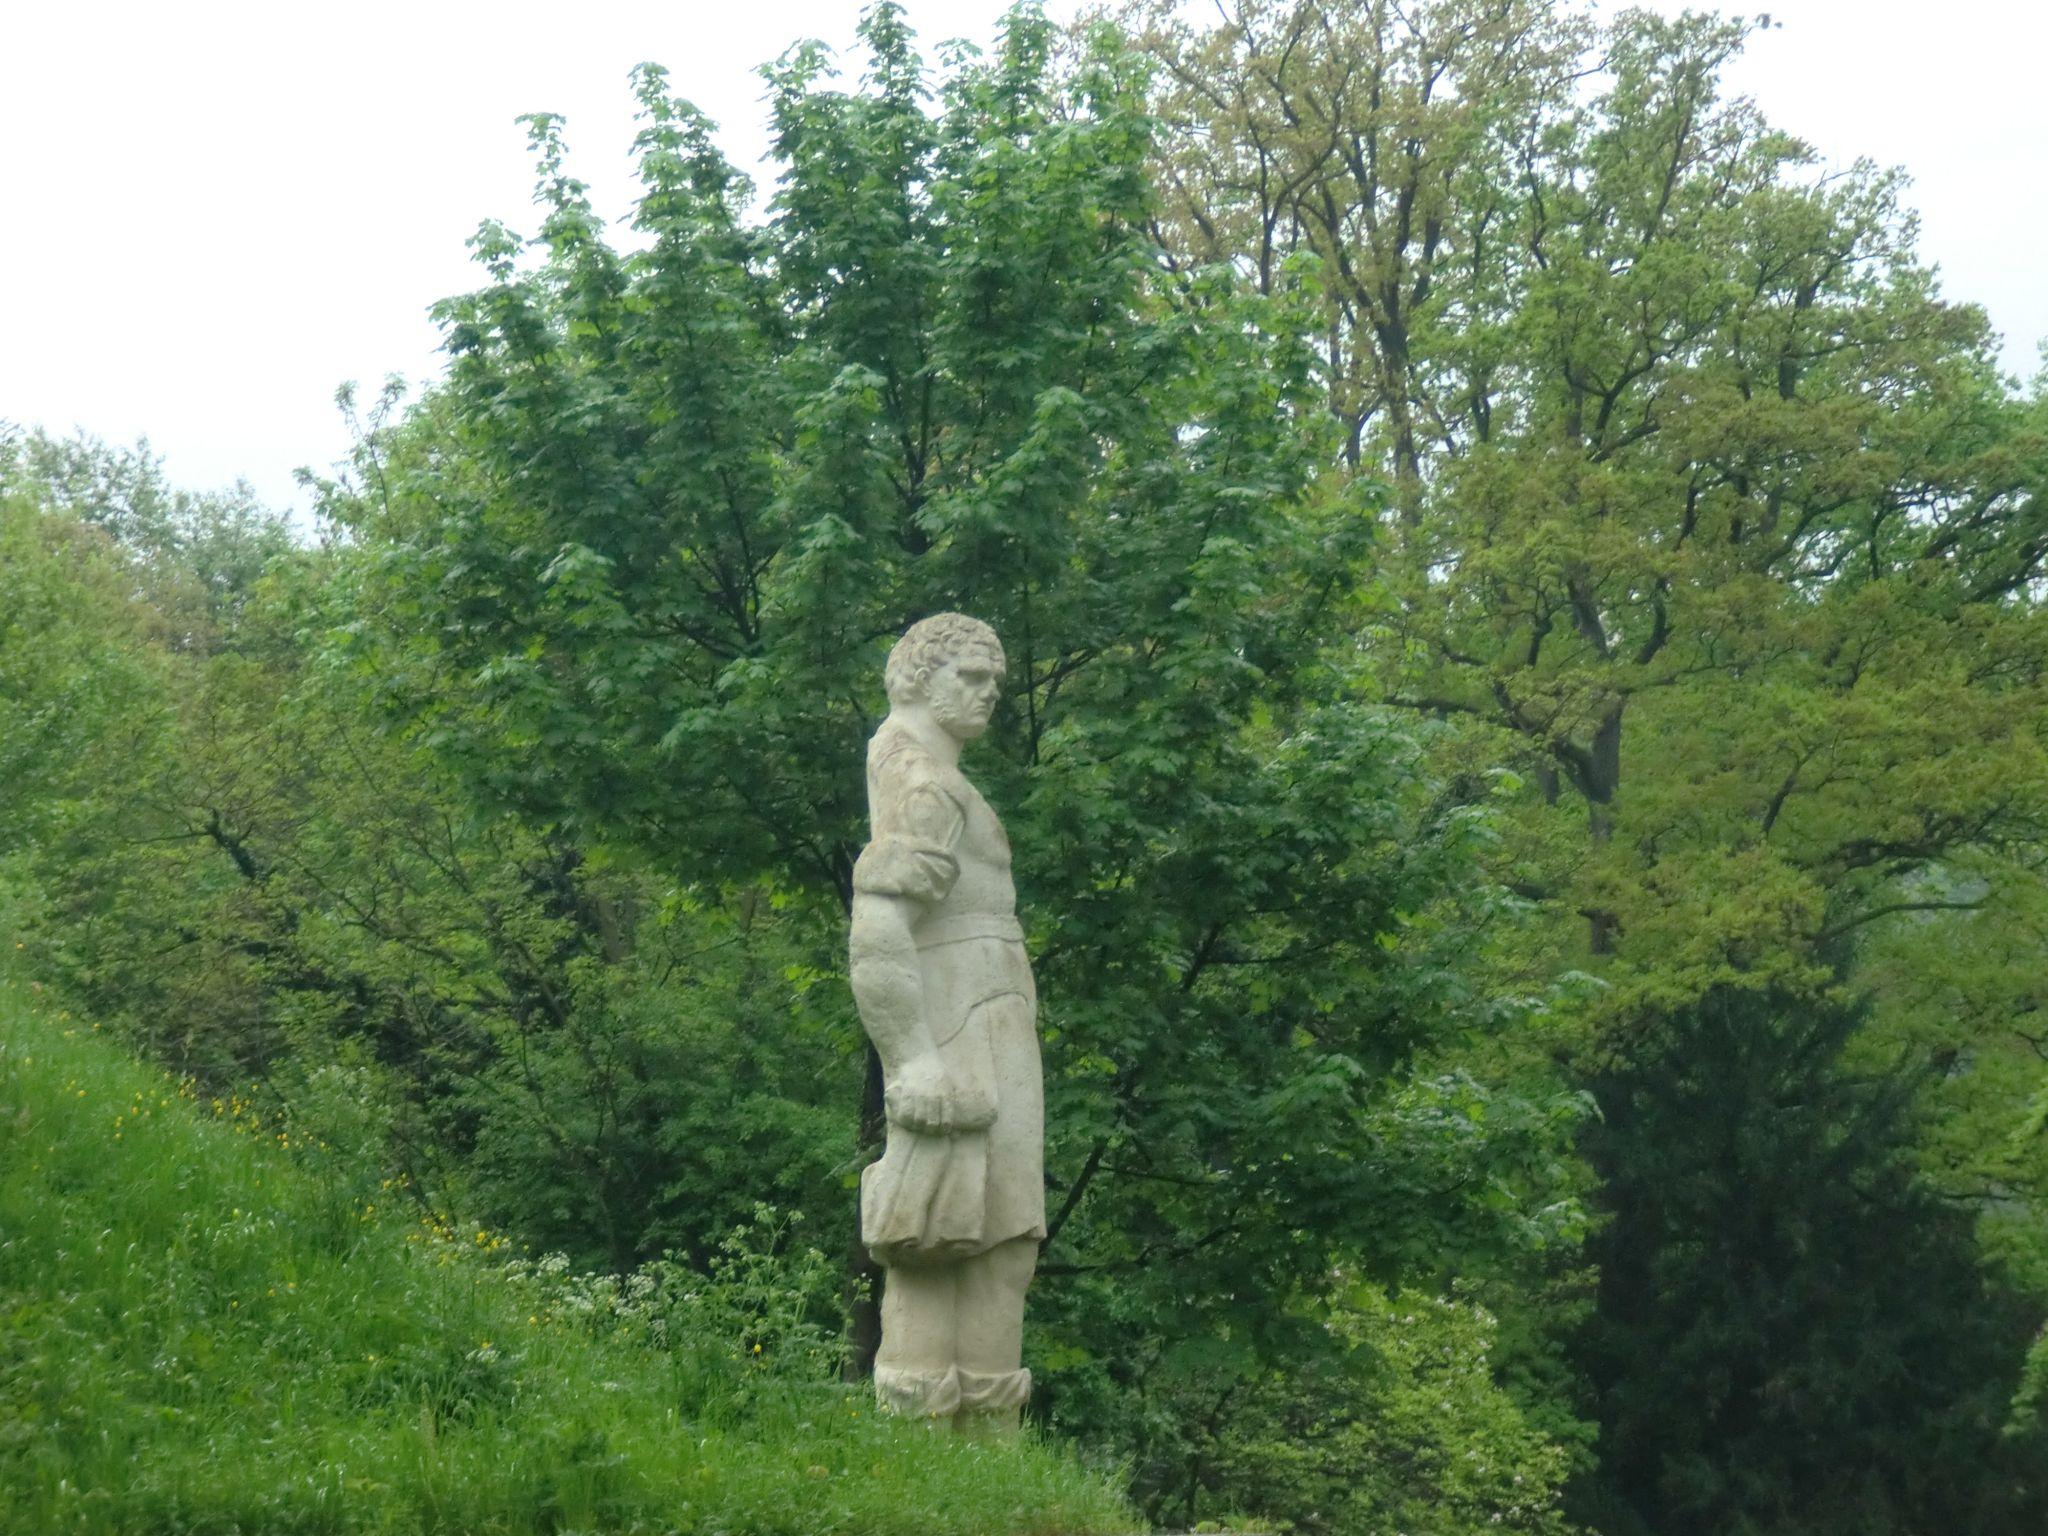 Graz park 8 - Graz: tradition and modernity